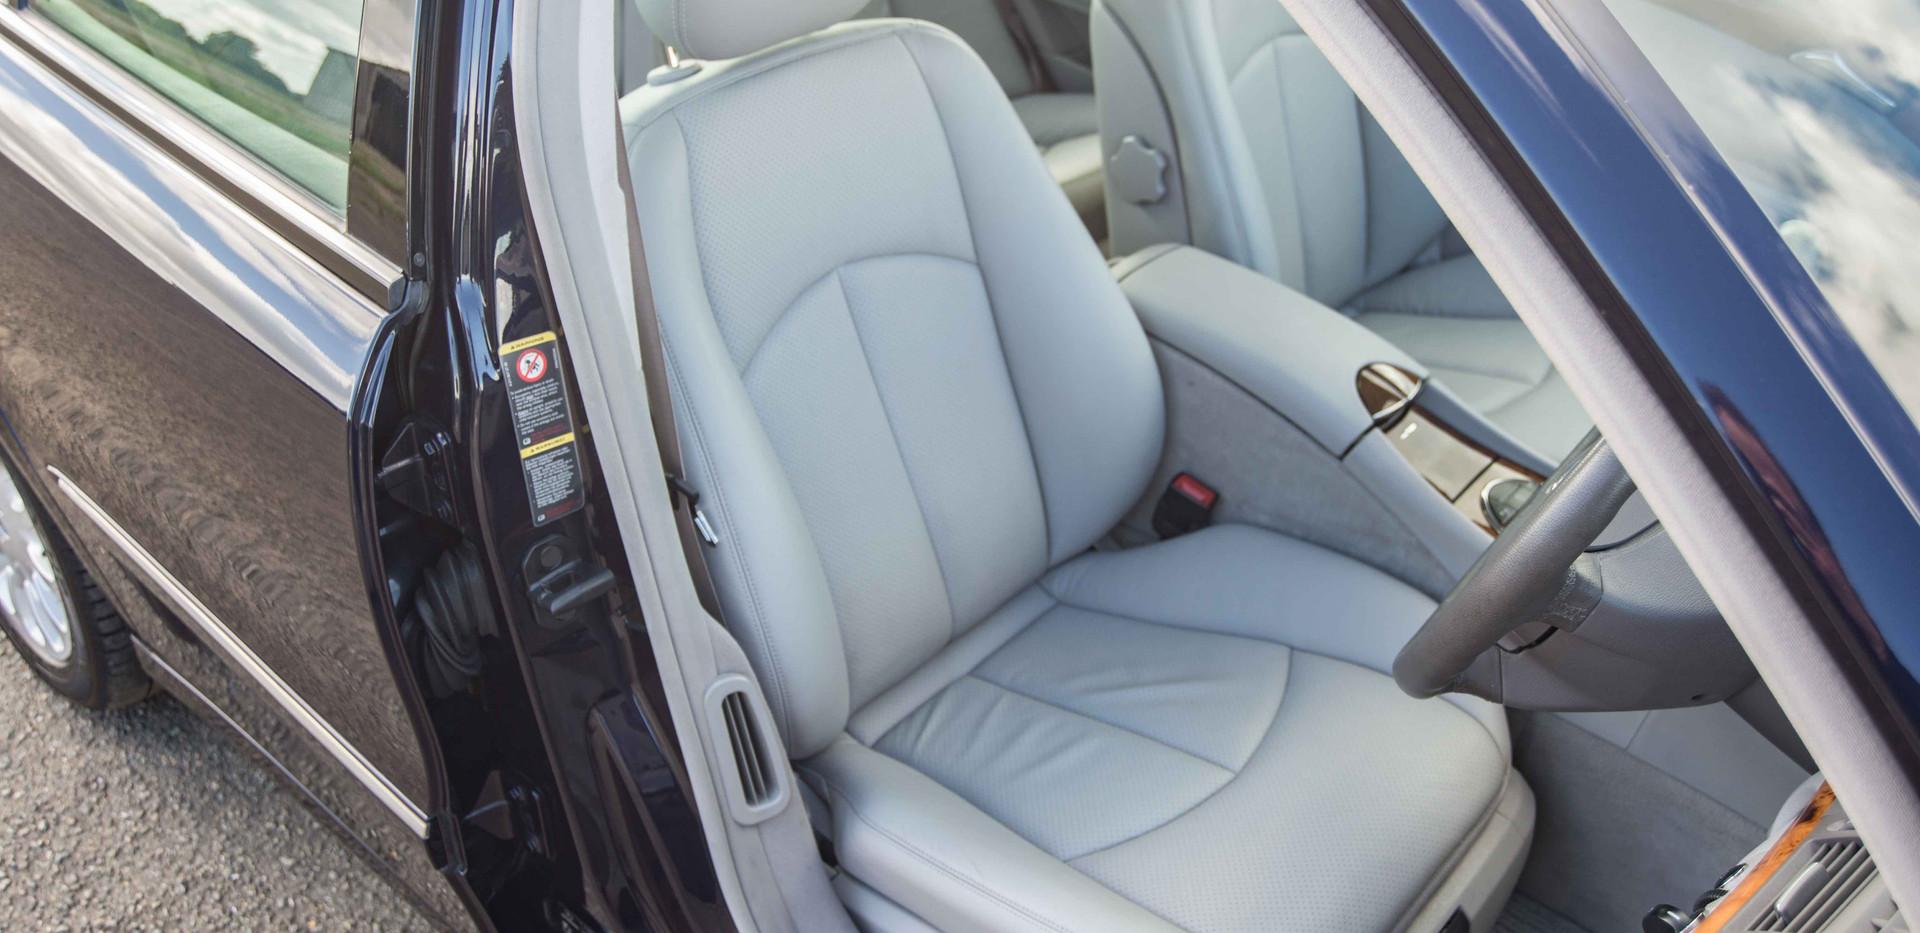 Mercedes E500 For Sale UK London  (33 of